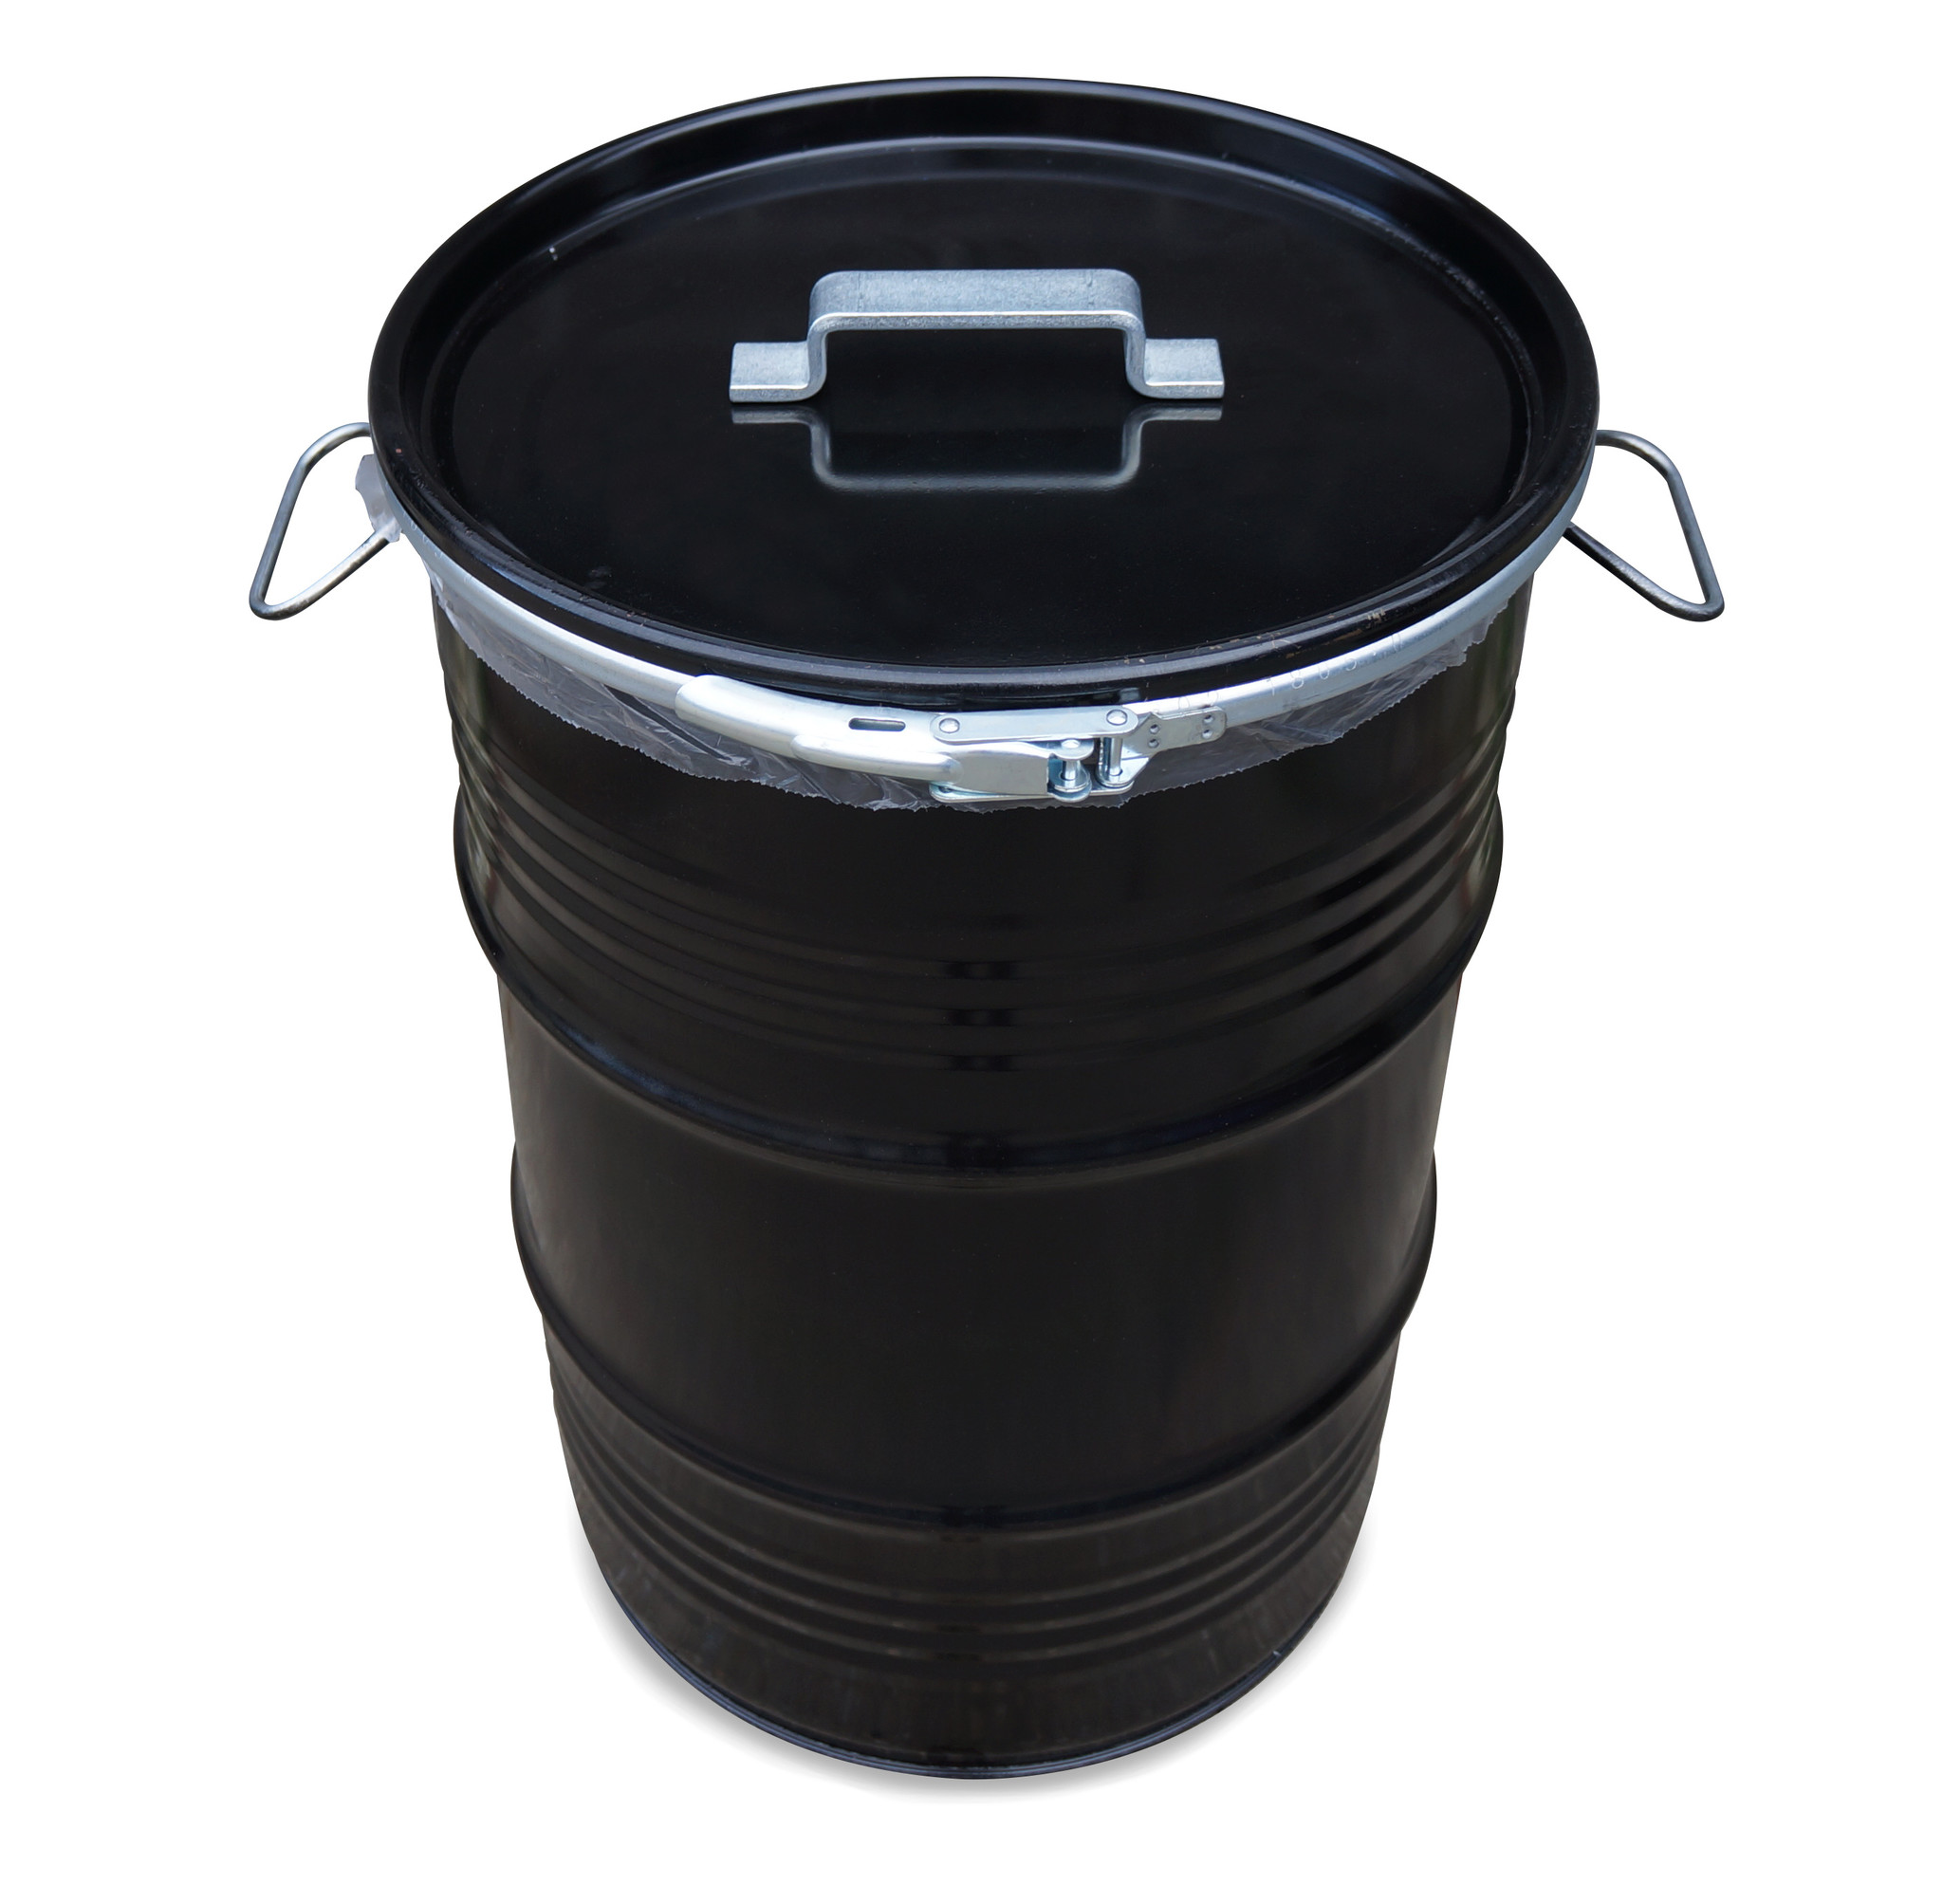 The Binbin BinBin Handle industrile prullenbak zwart 60 Liter met handvat